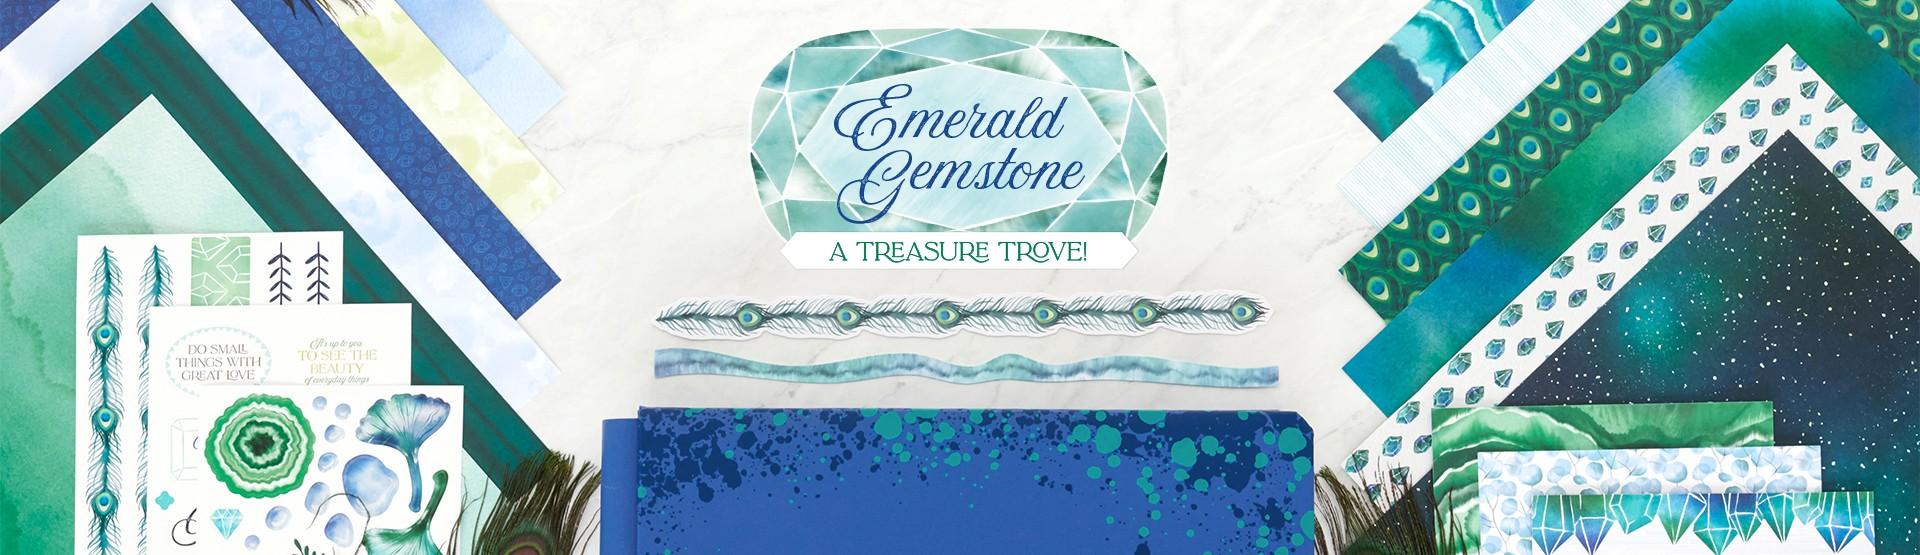 Natural Wonders Scrapbooking Supplies: Emerald Gemstone